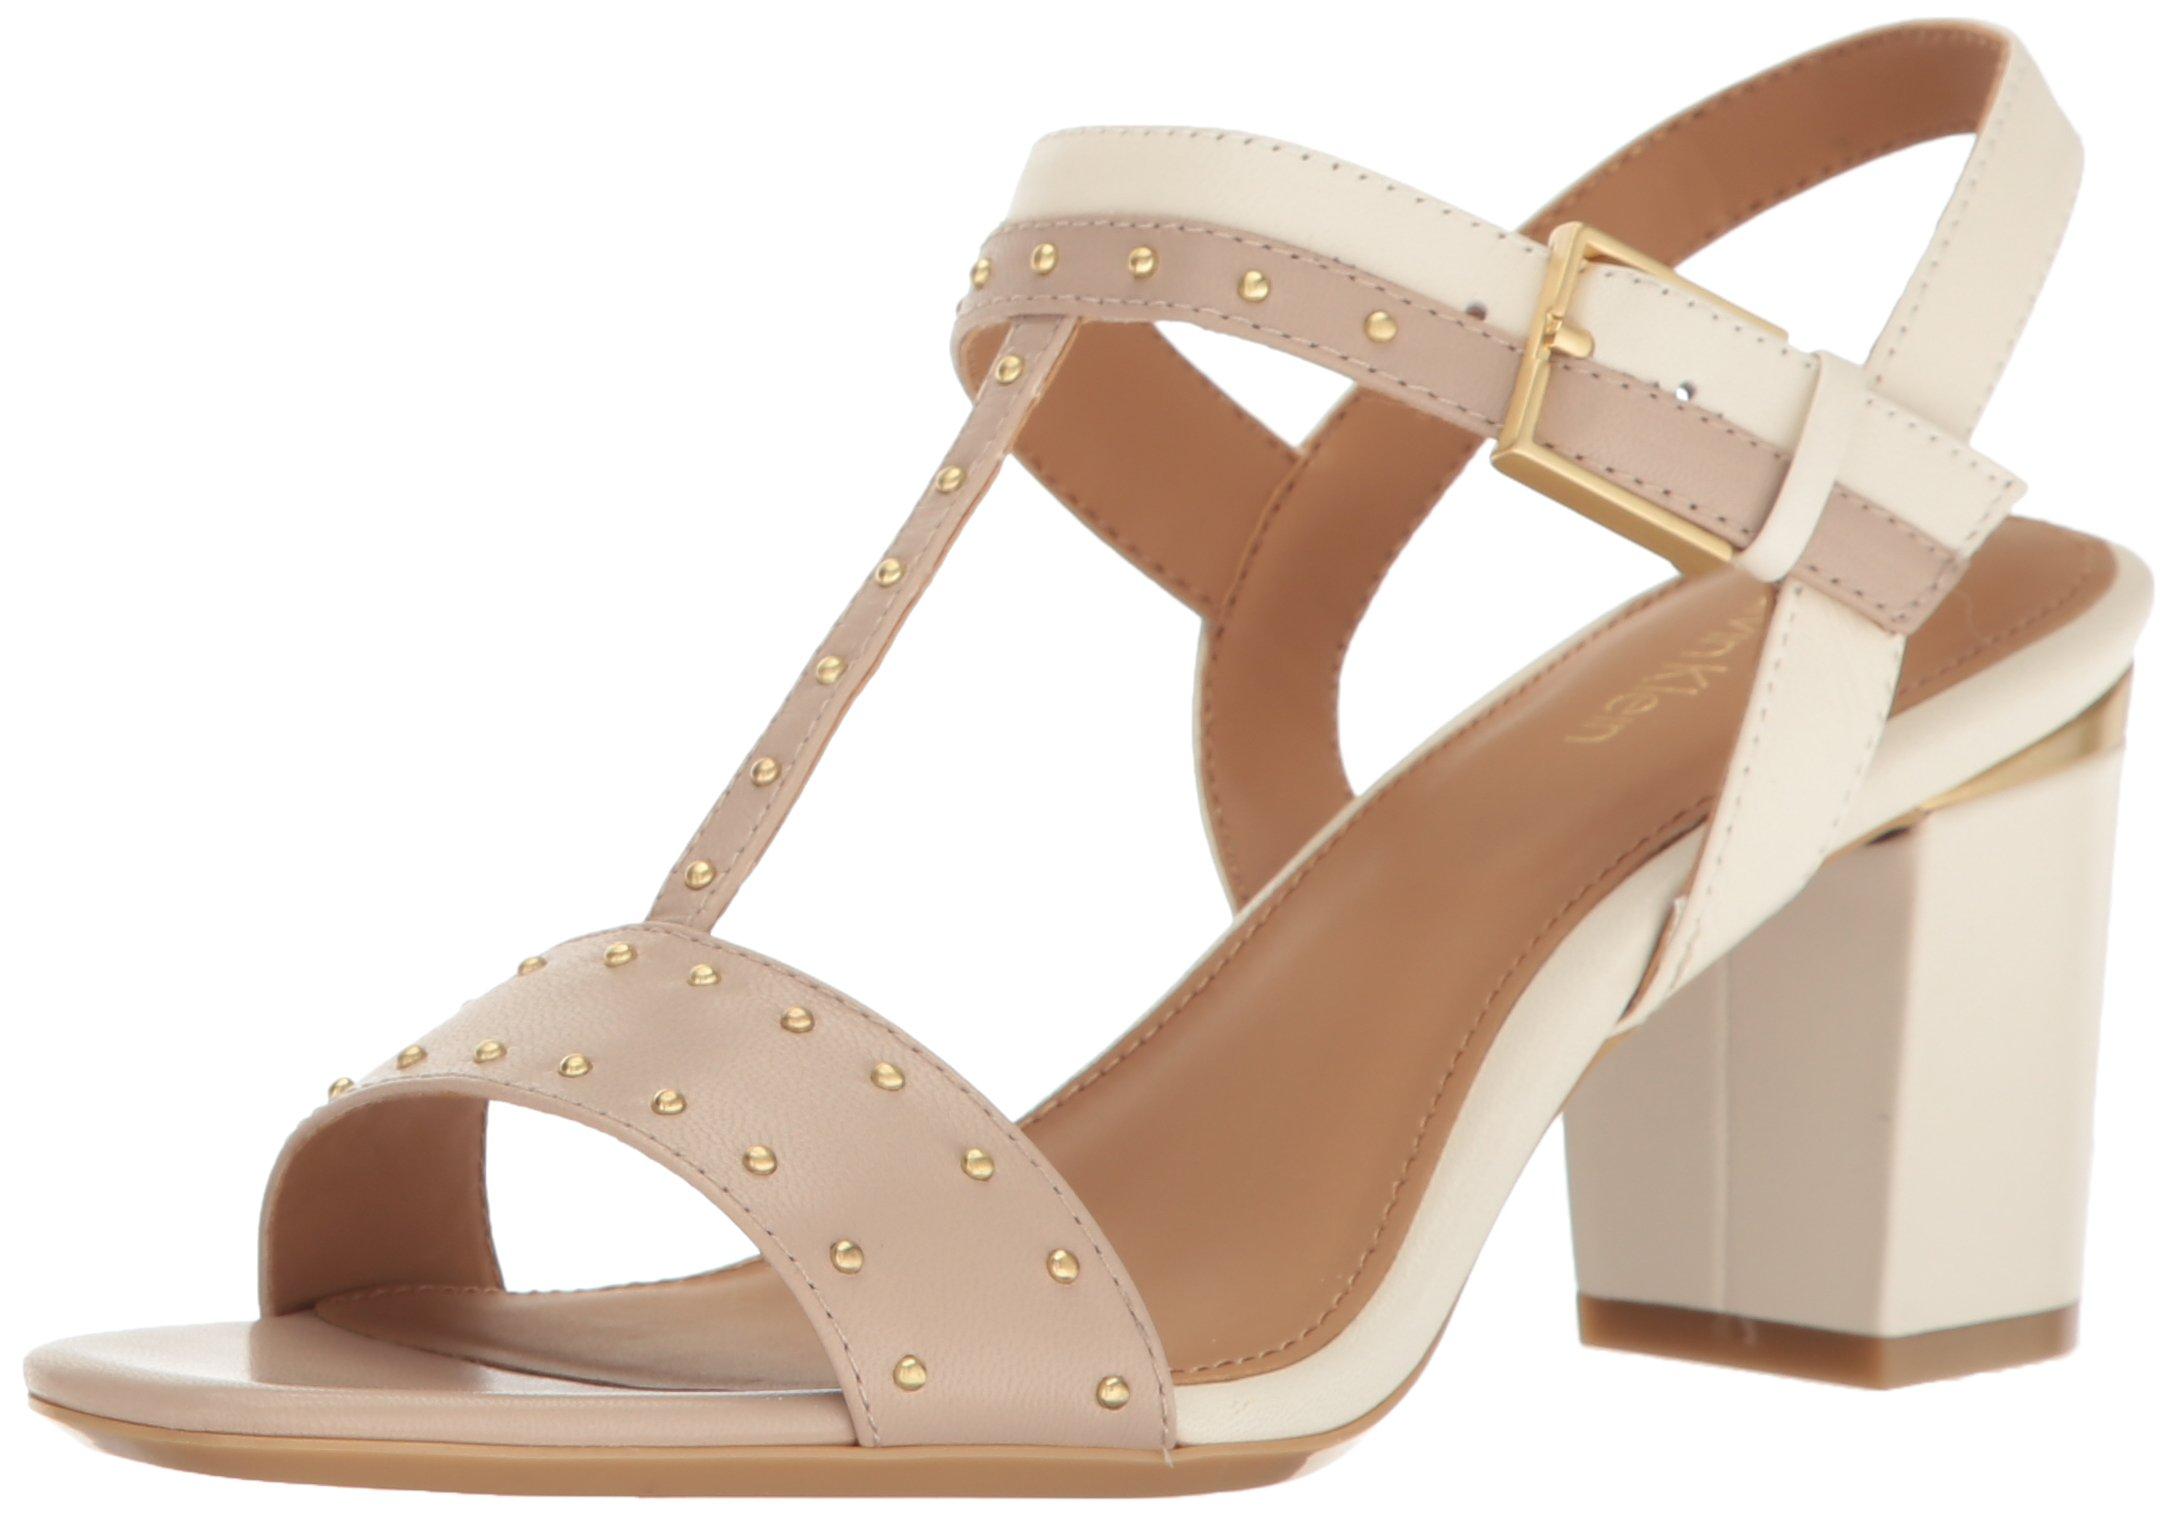 Calvin Klein Women's Carline Dress Sandal, Cocoon/Soft White, 8.5 M US by Calvin Klein